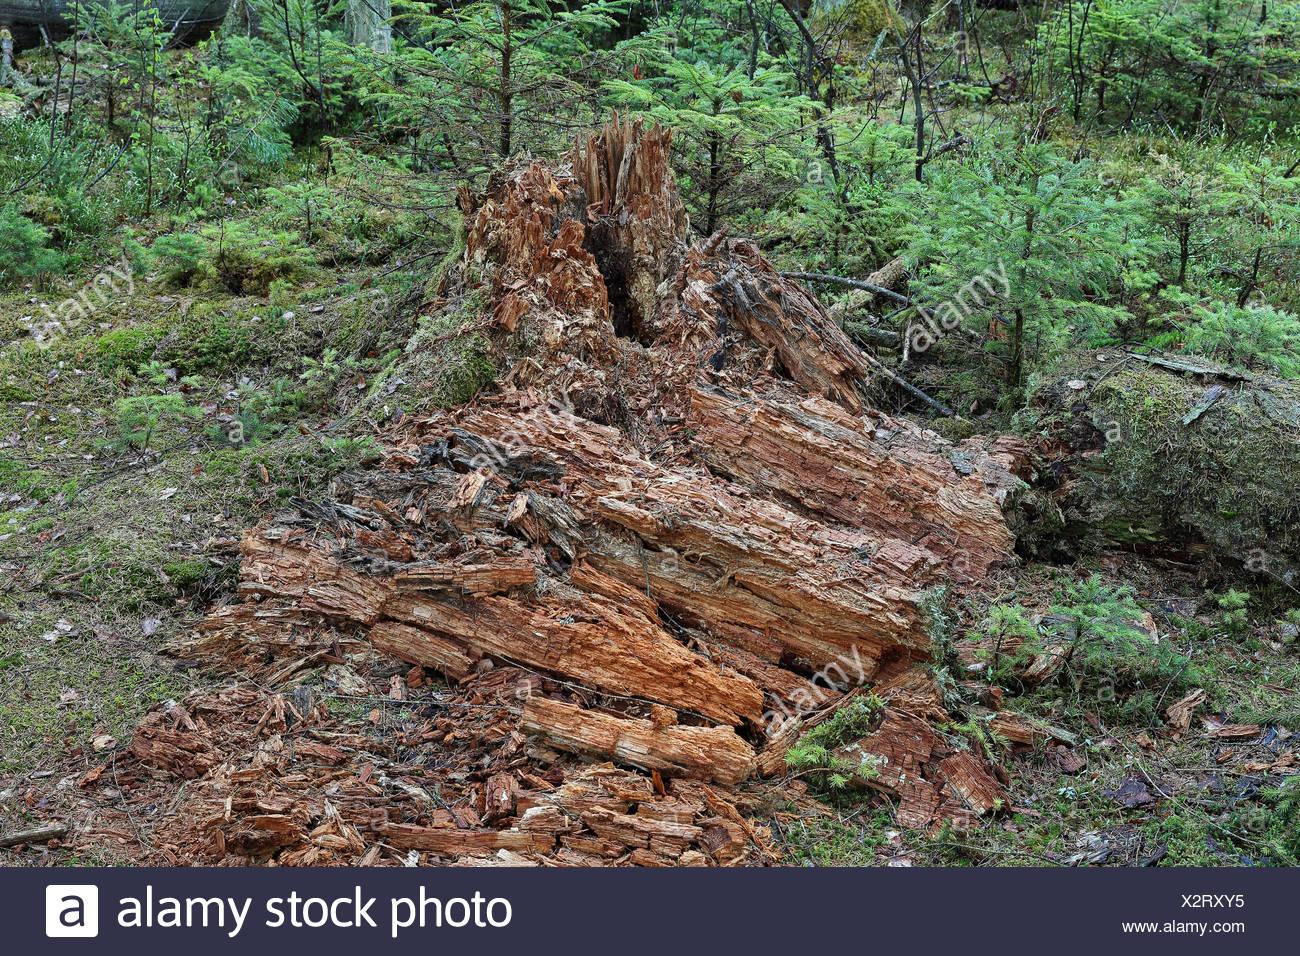 Holzzerfall, Bannwald, Pfrunger-Burgweiler Ried, Deutschland Stock Photo